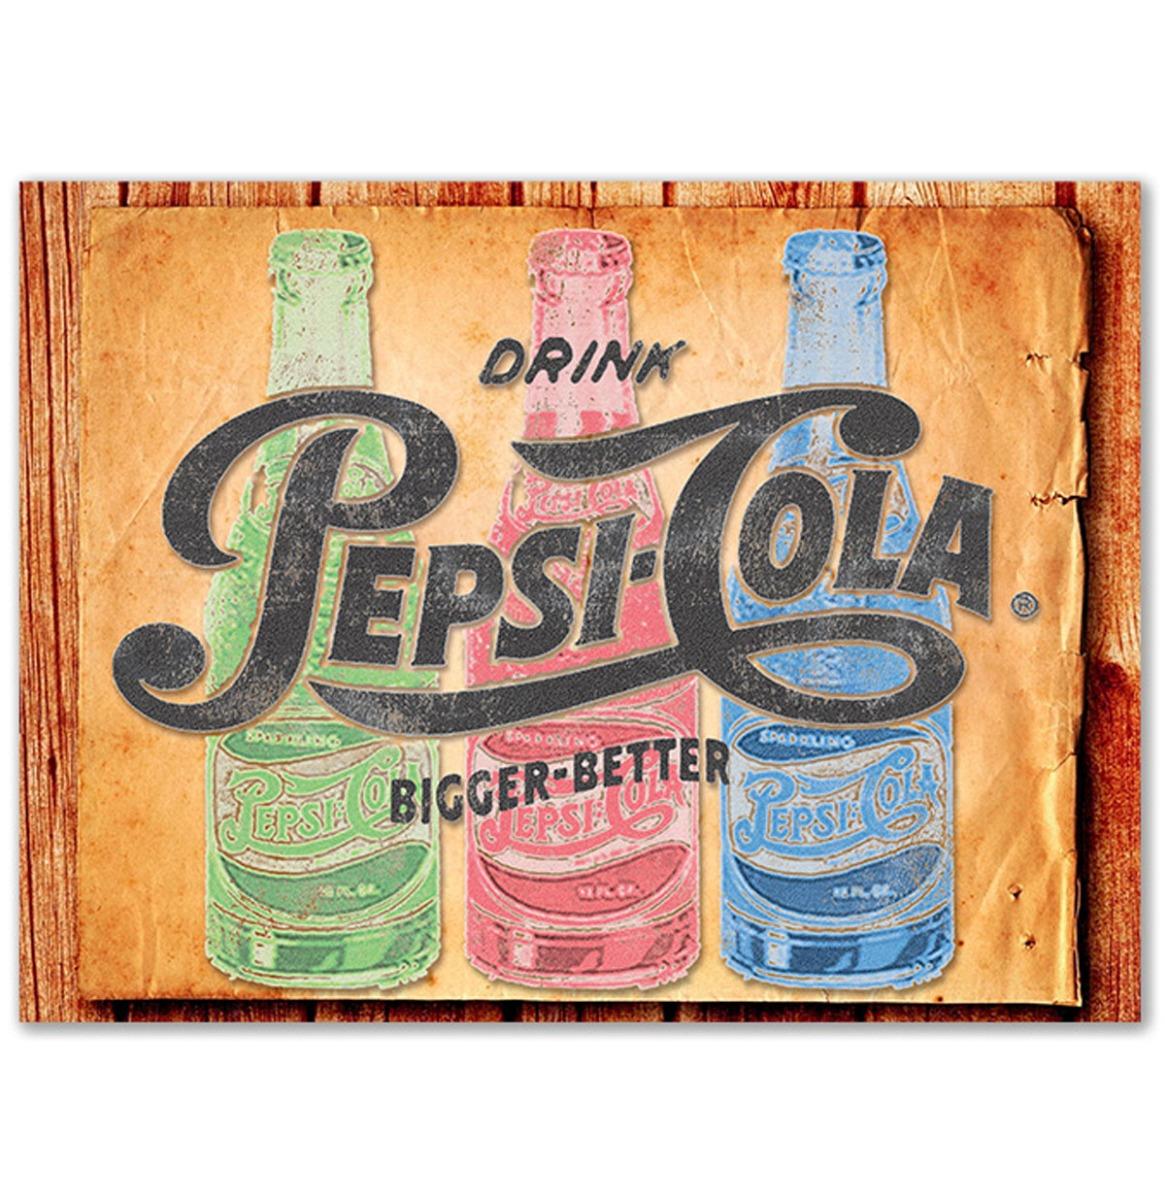 Pepsi-Cola Bigger And Better 3 Bottles Glazen Snijplank - 40 x 30 cm